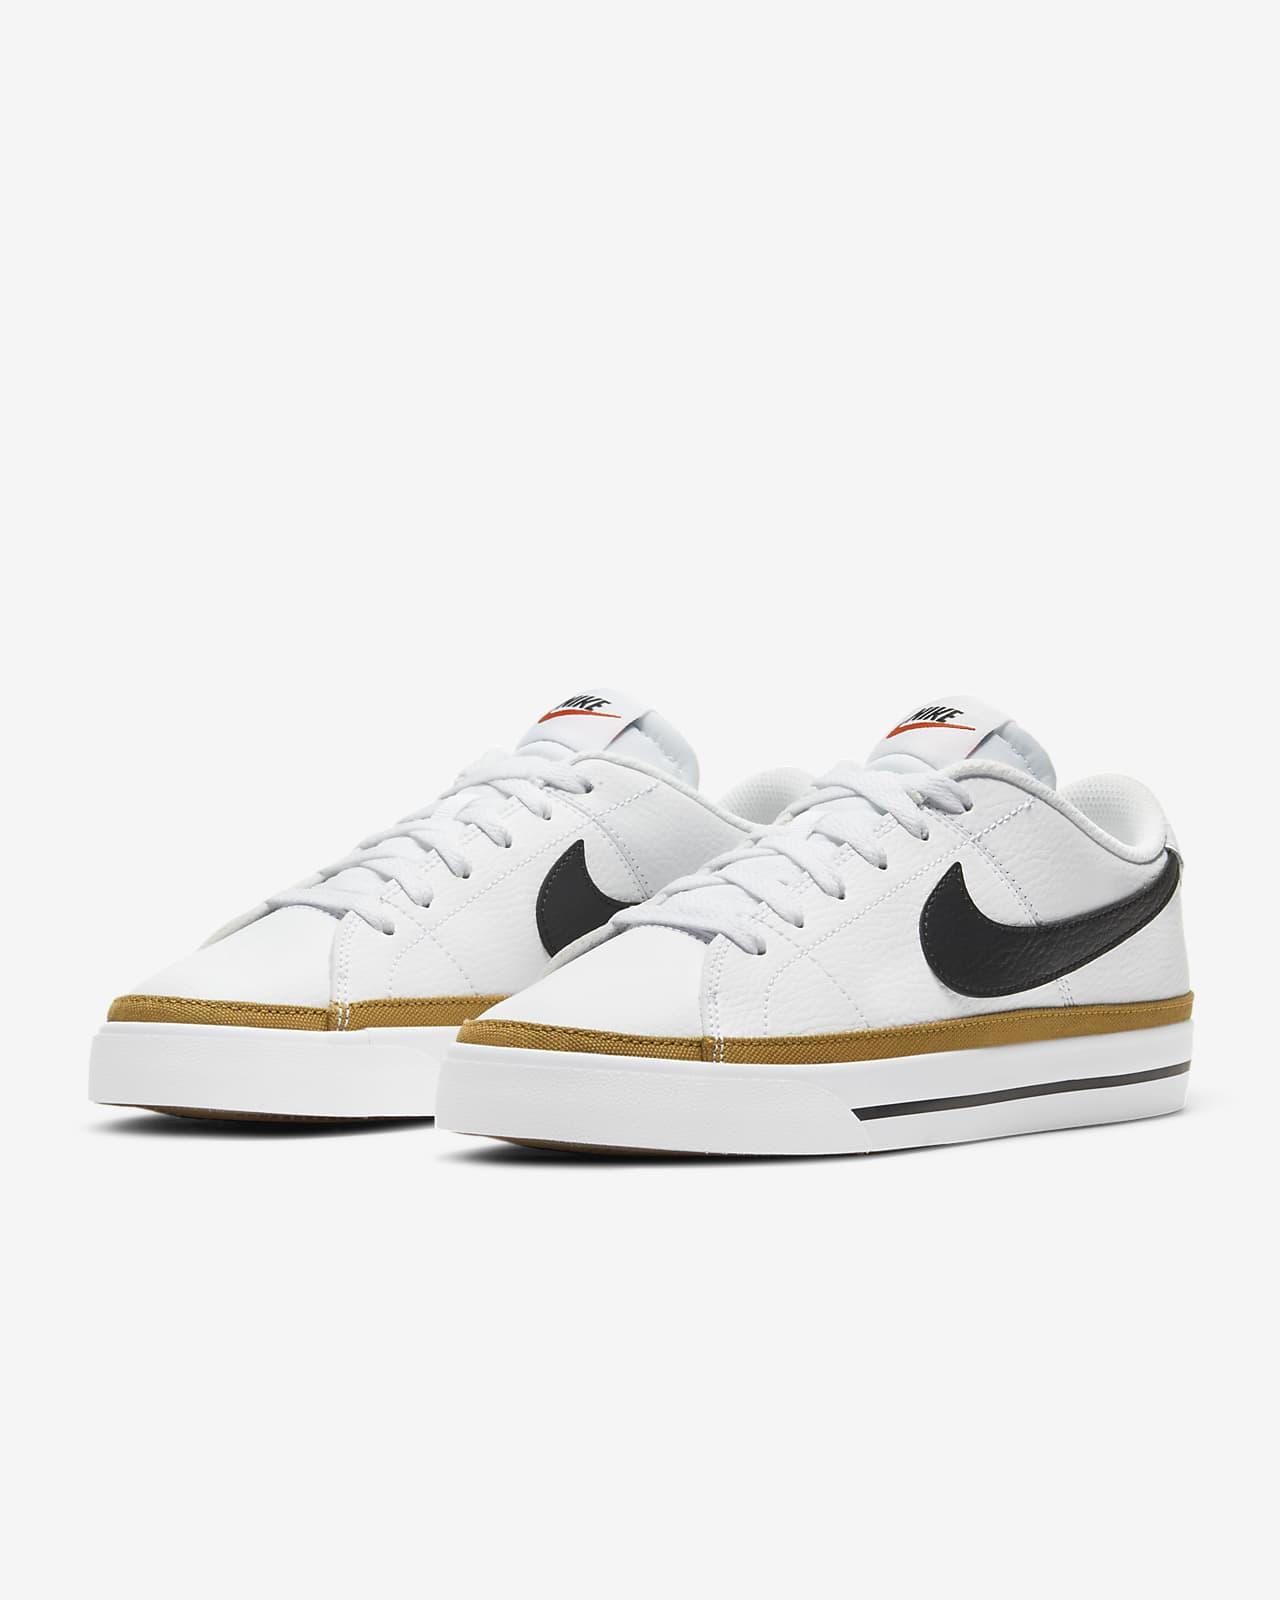 NikeCourt Legacy Women's Shoe. Nike PT